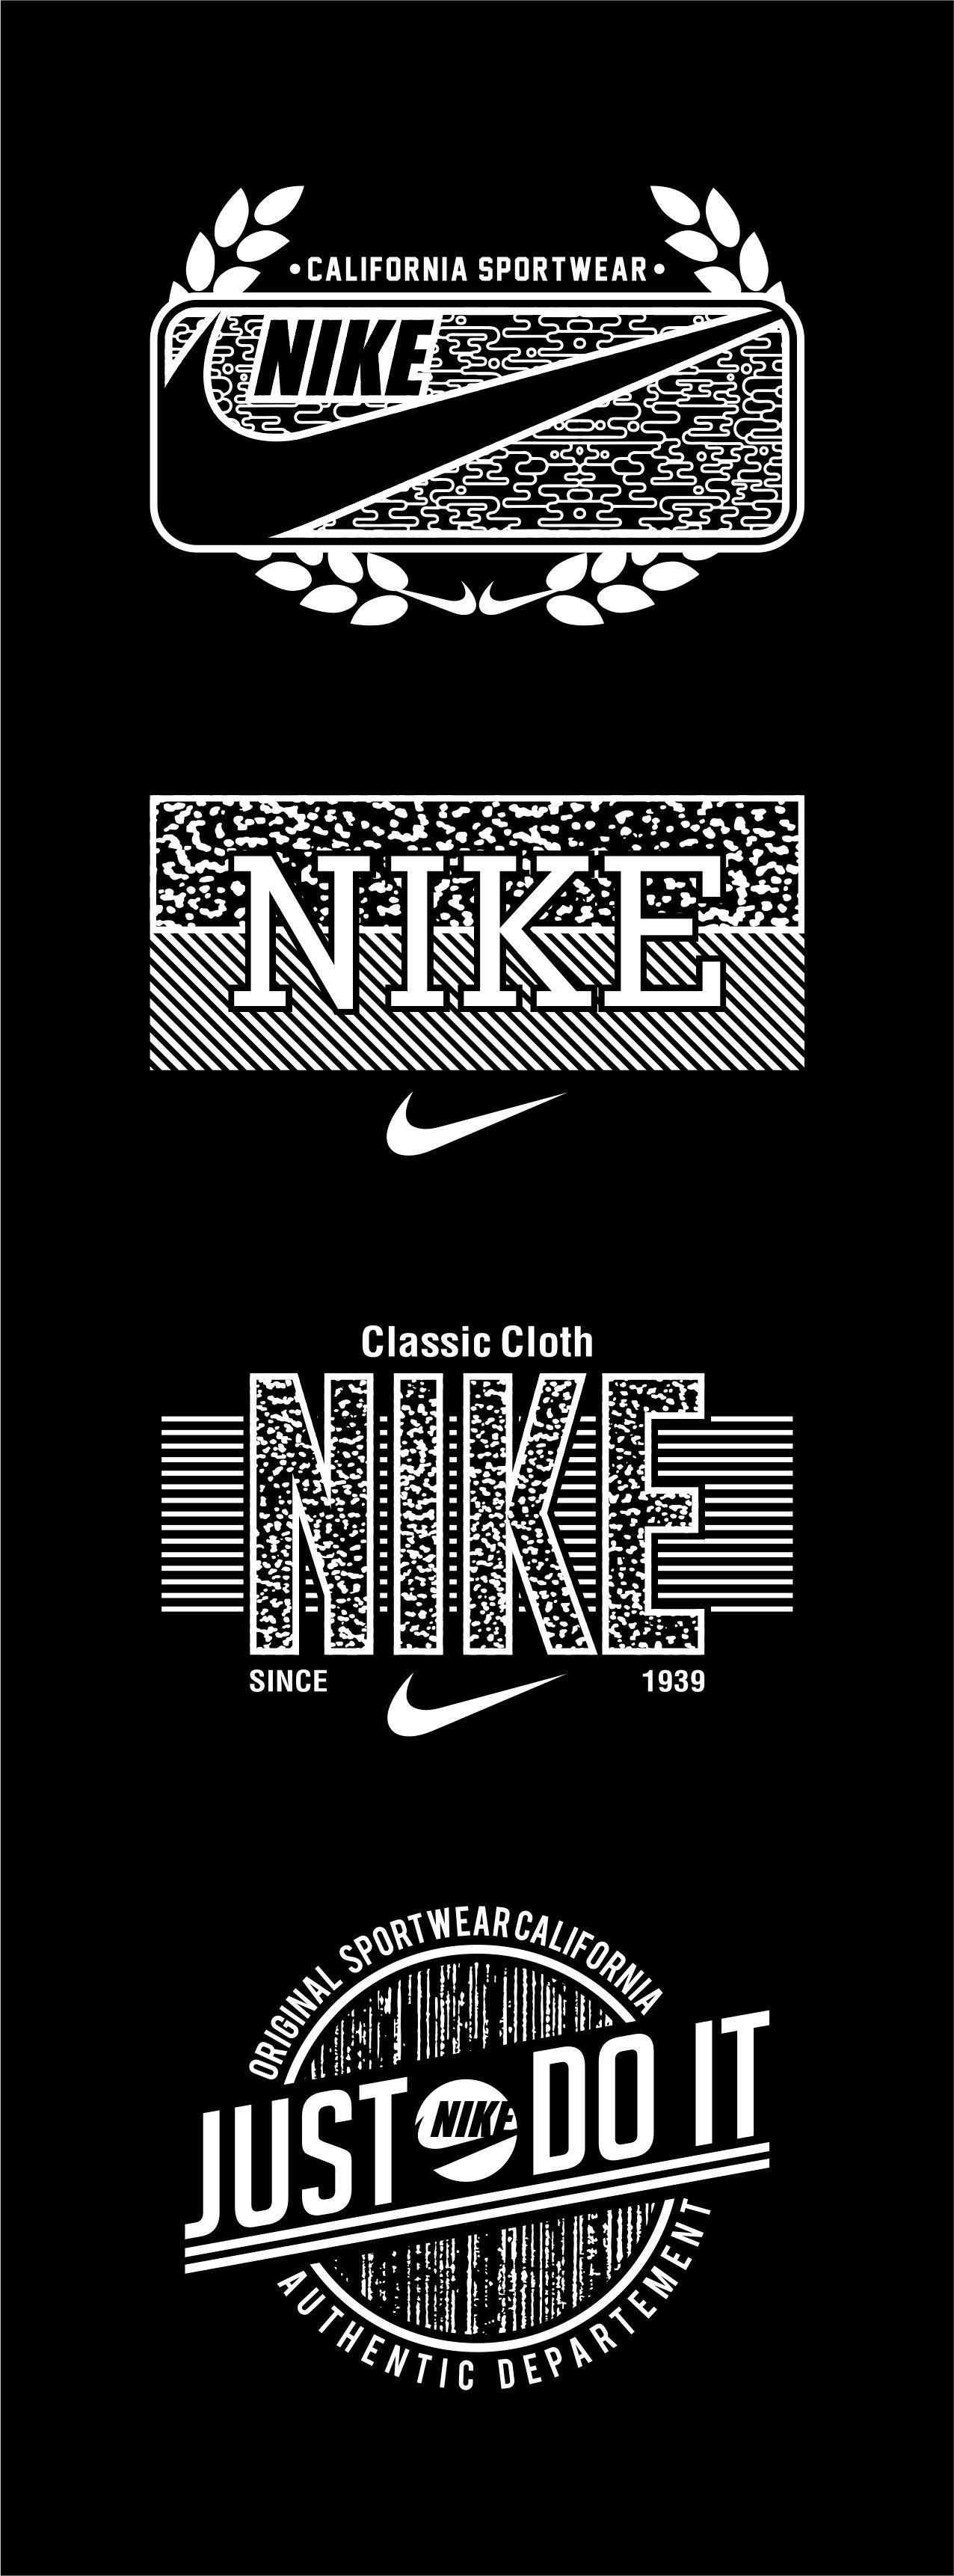 size 40 4c1f5 8e435 Vintage Nike vintage vector vintagevector volcom adidas billabong  rusty